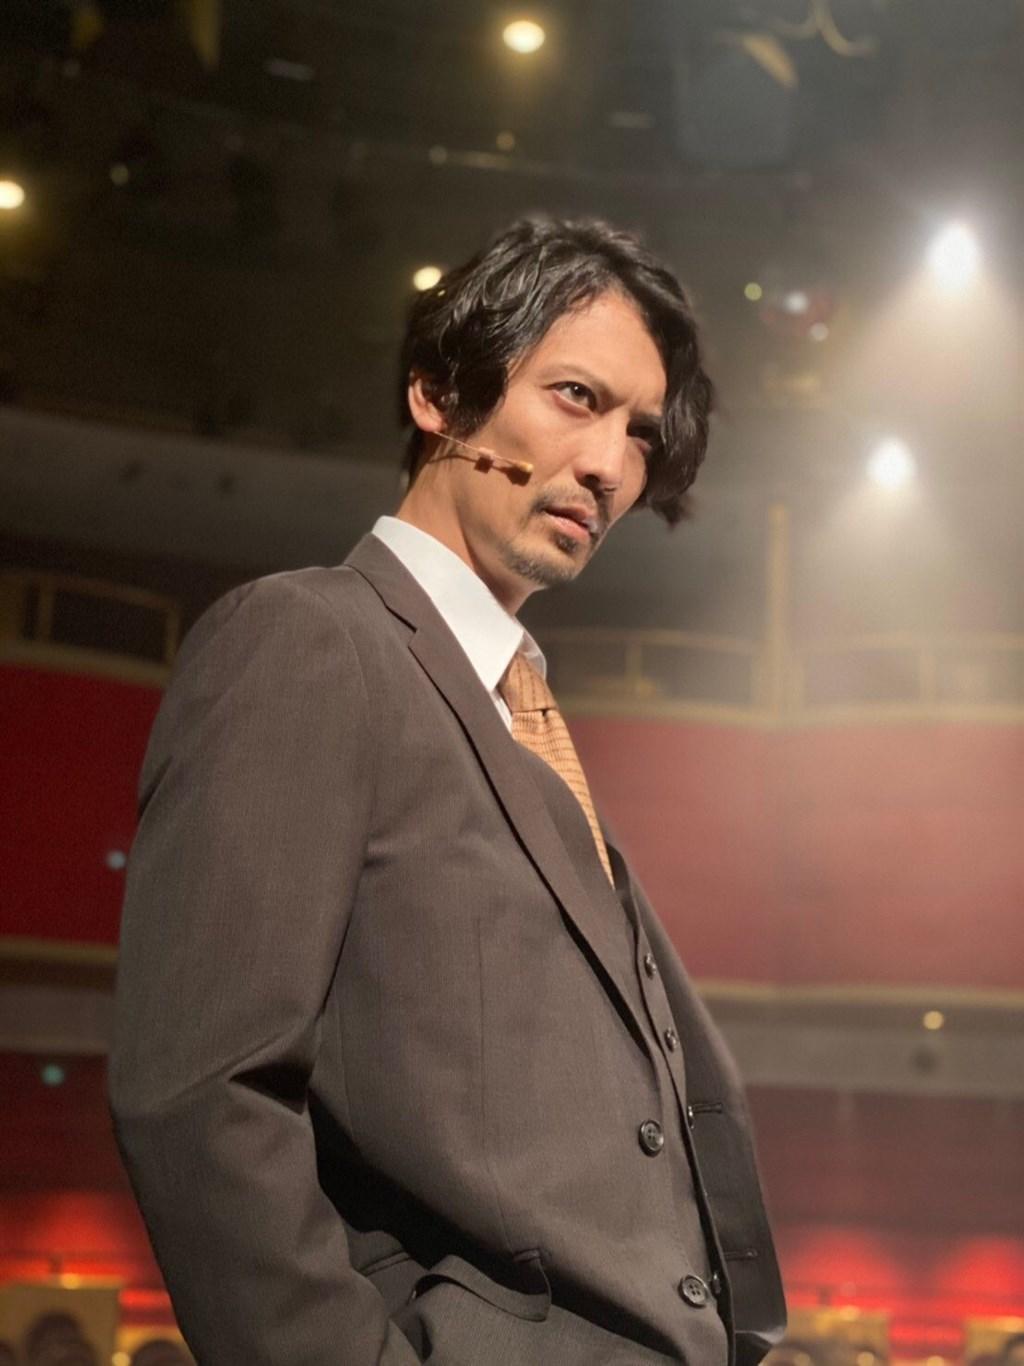 NHK報導,電視劇兼舞台劇演員窪寺昭13日逝世,享年43歲。(圖取自twitter.com/kubodealer)